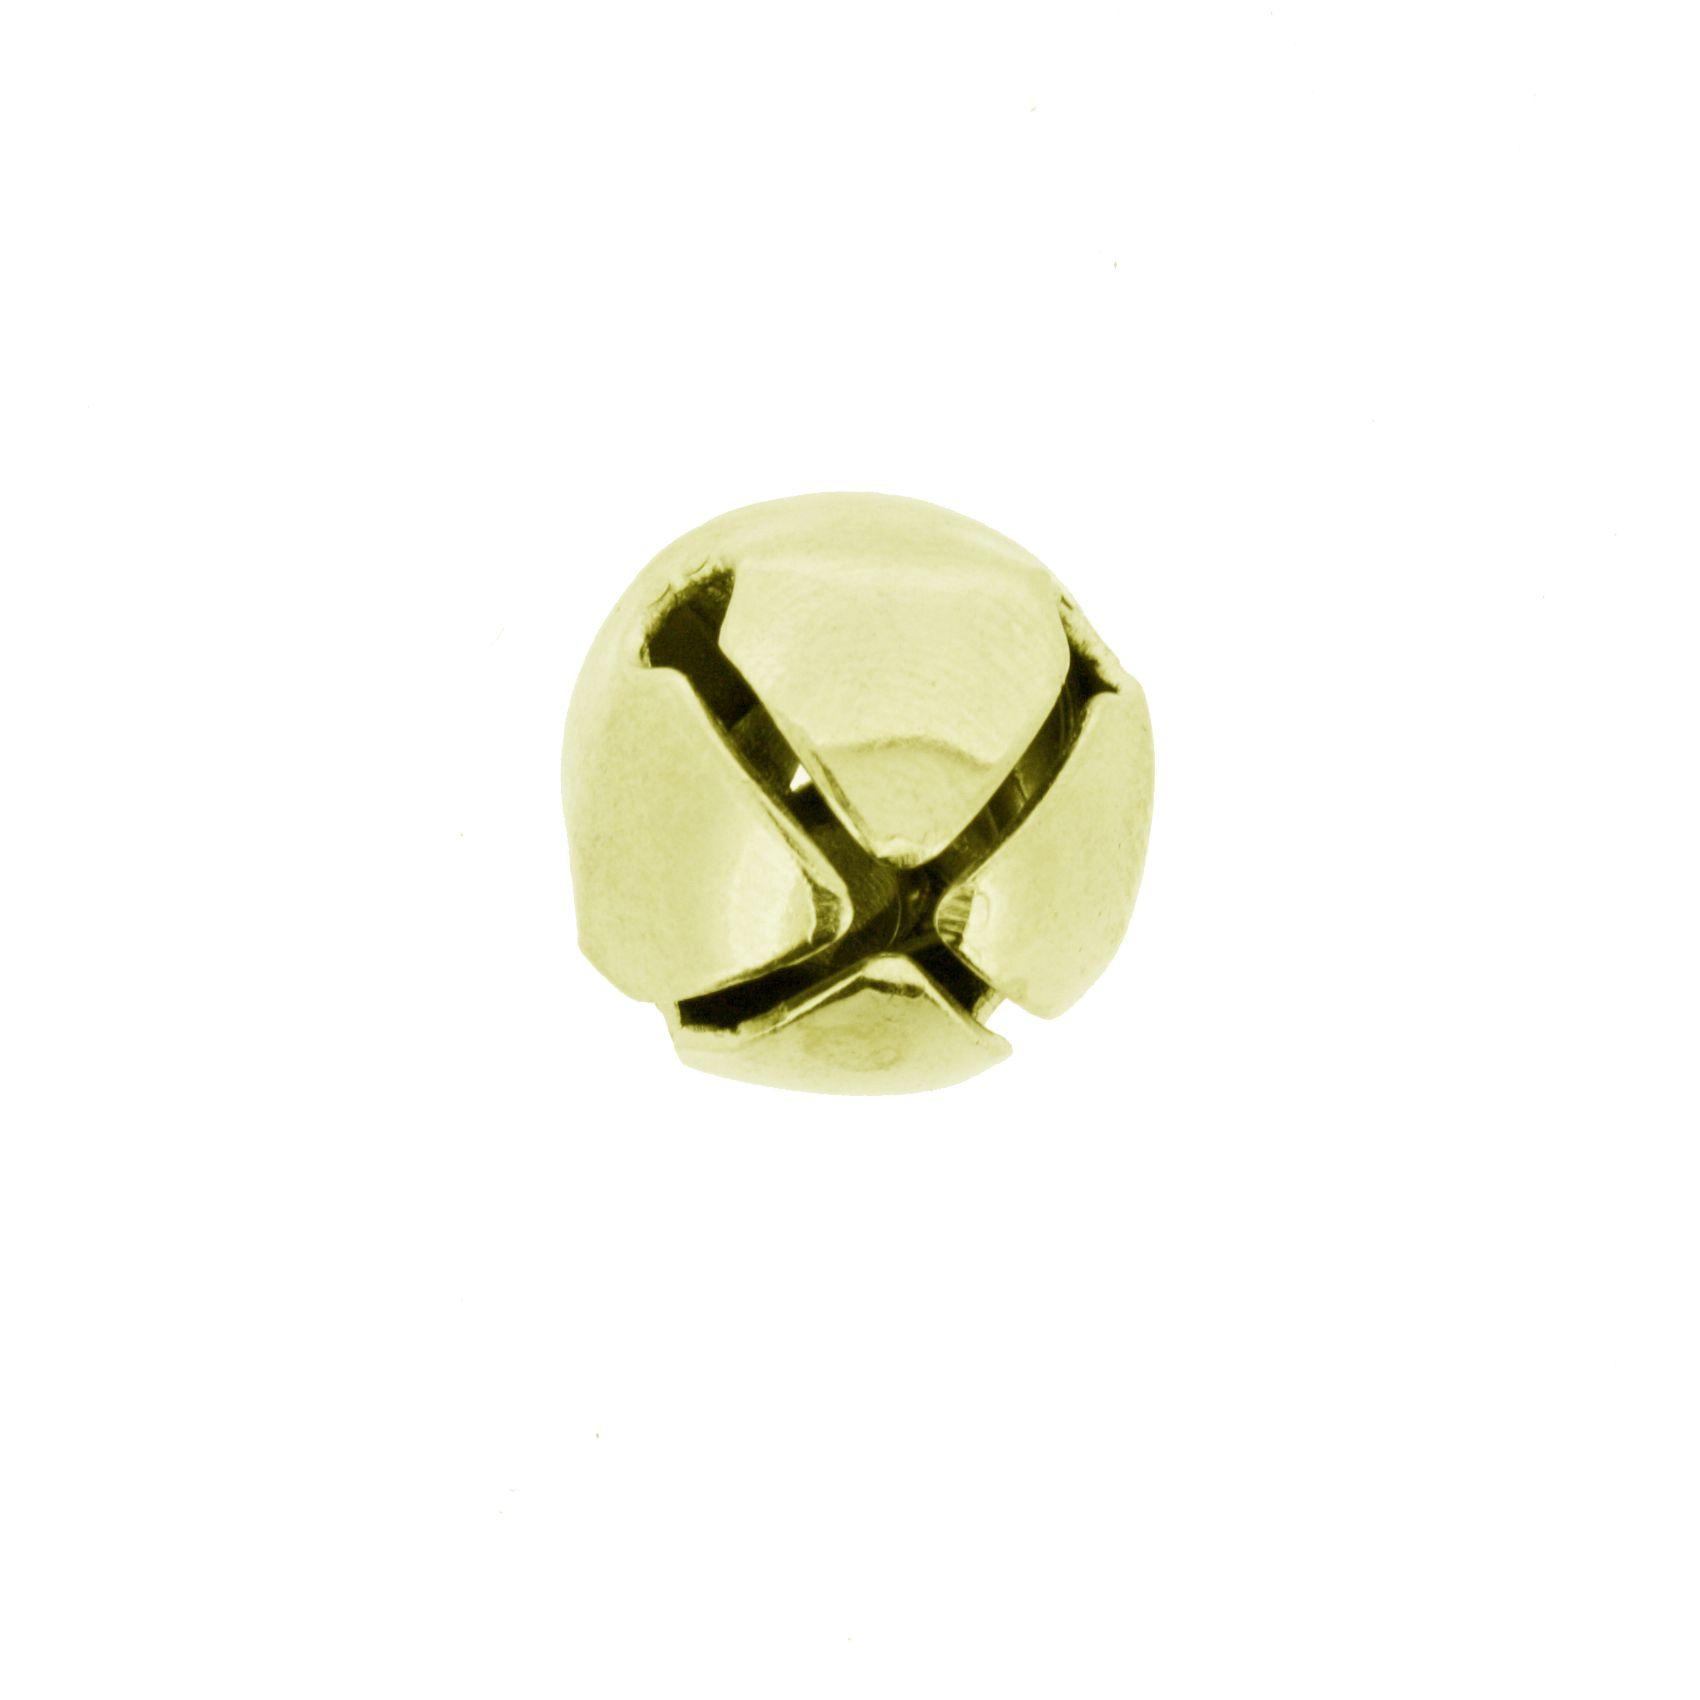 Guizo - Xaôro nº2 - Dourado - 01 peça  - Universo Religioso® - Artigos de Umbanda e Candomblé